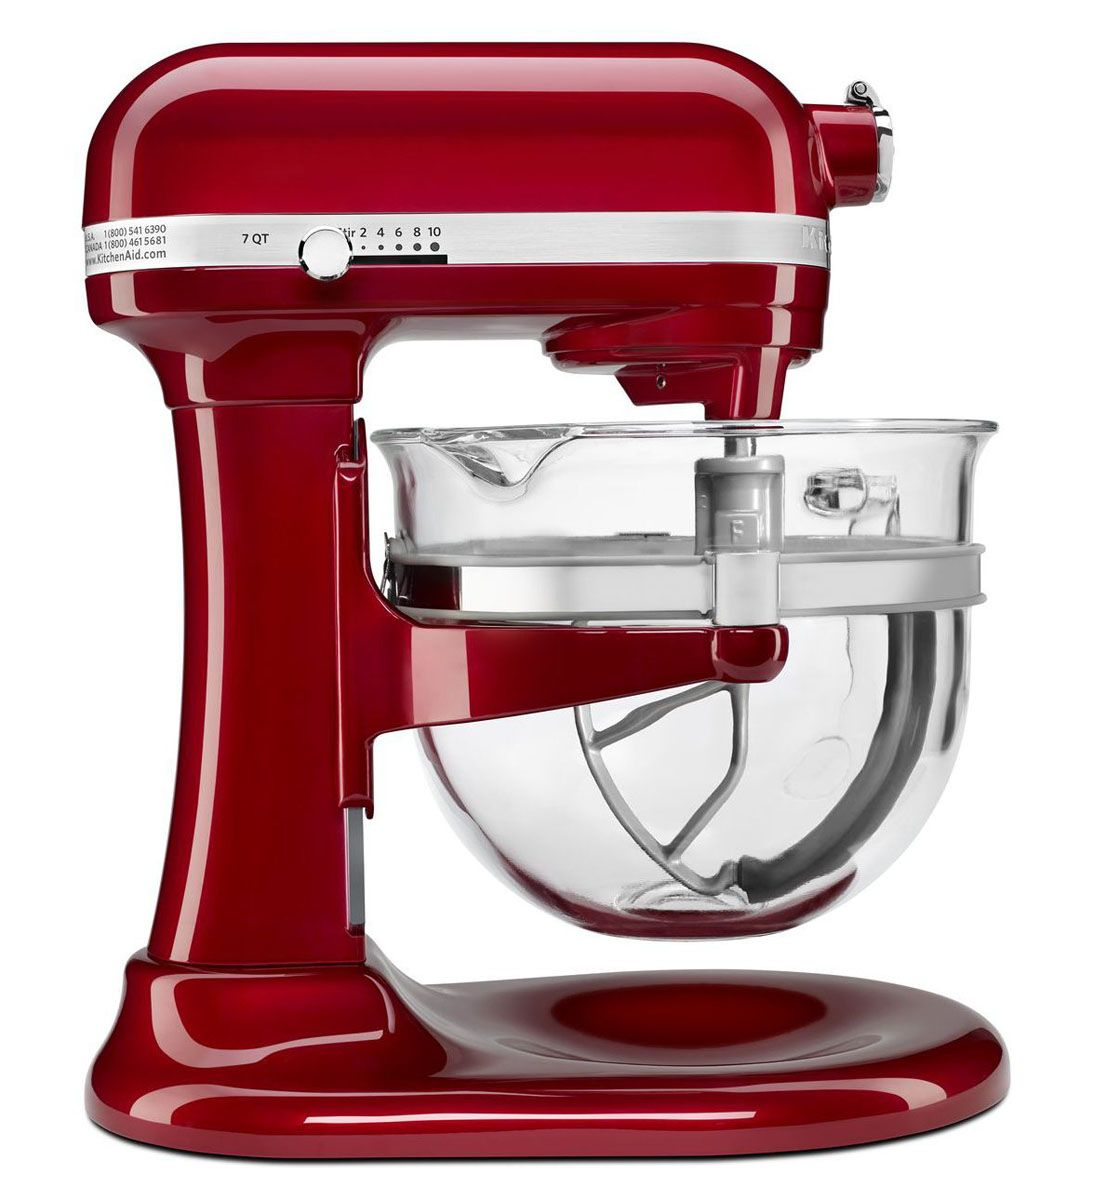 Kitchenaid 6500 Bowl Lift Stand Mixer Ksm6521xca